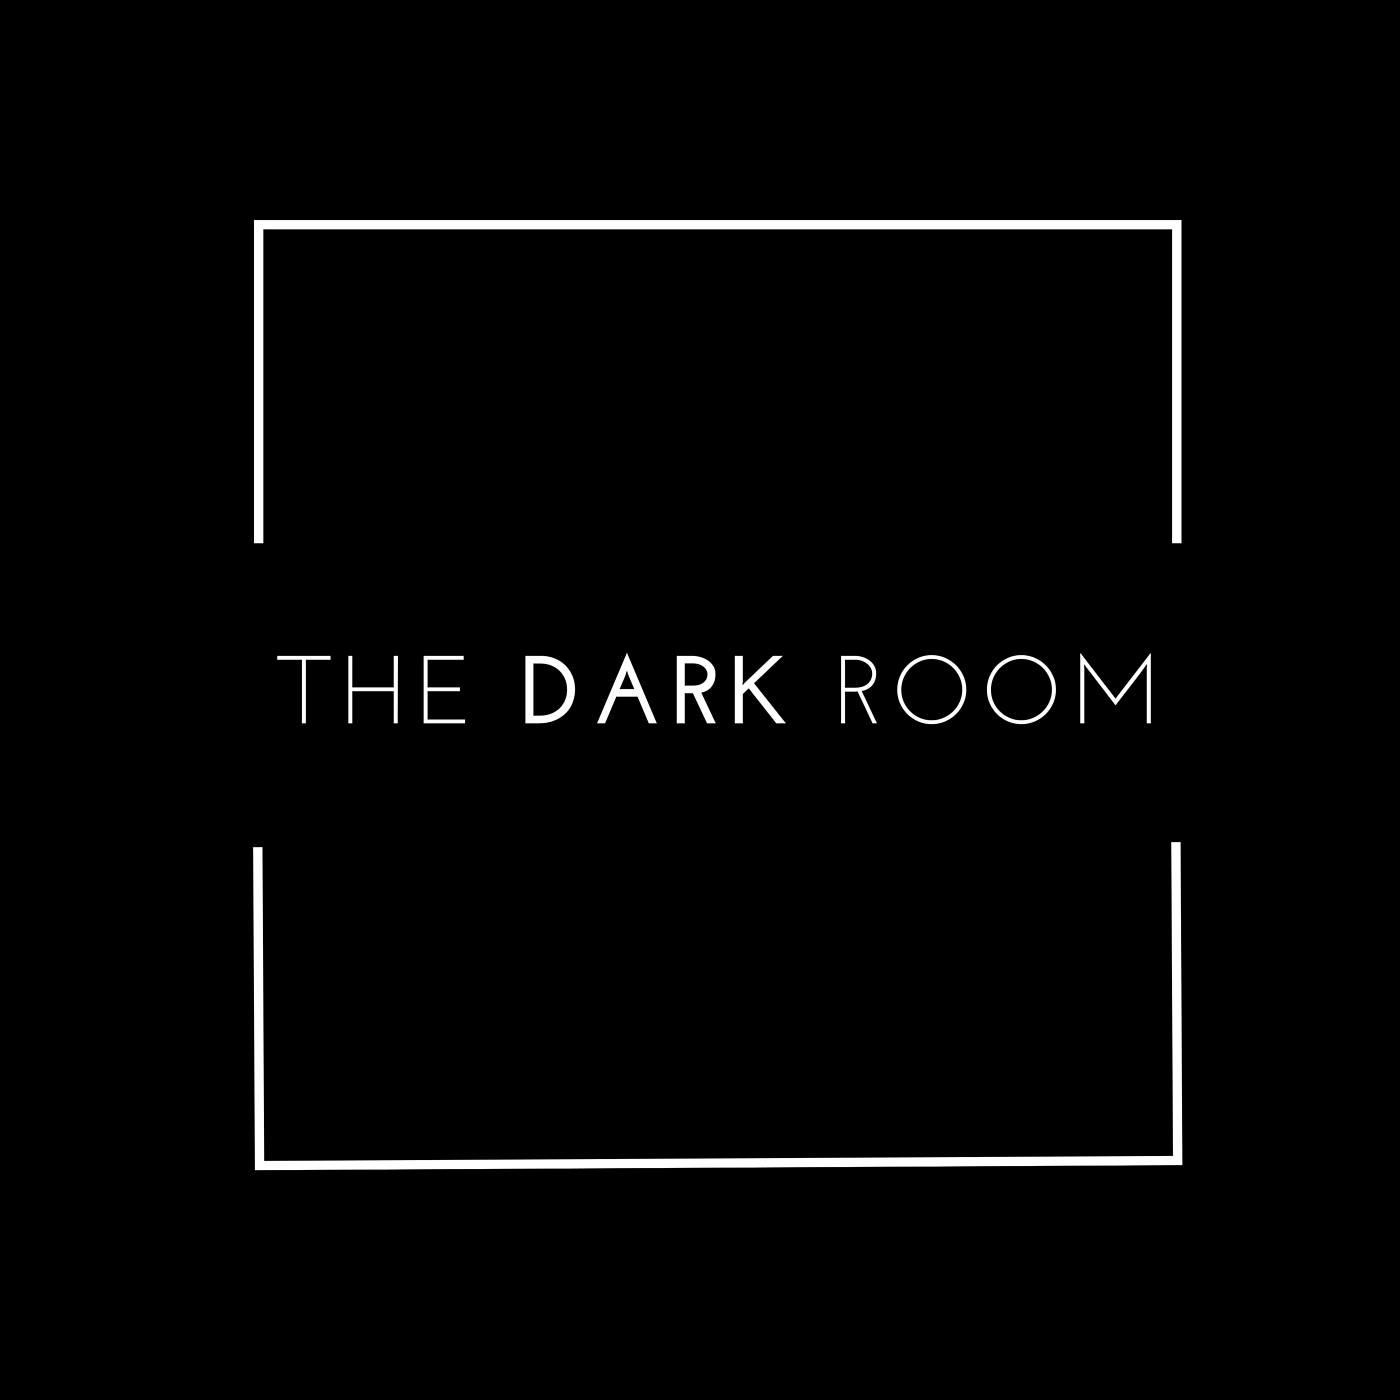 Dark Room: The Dark Room